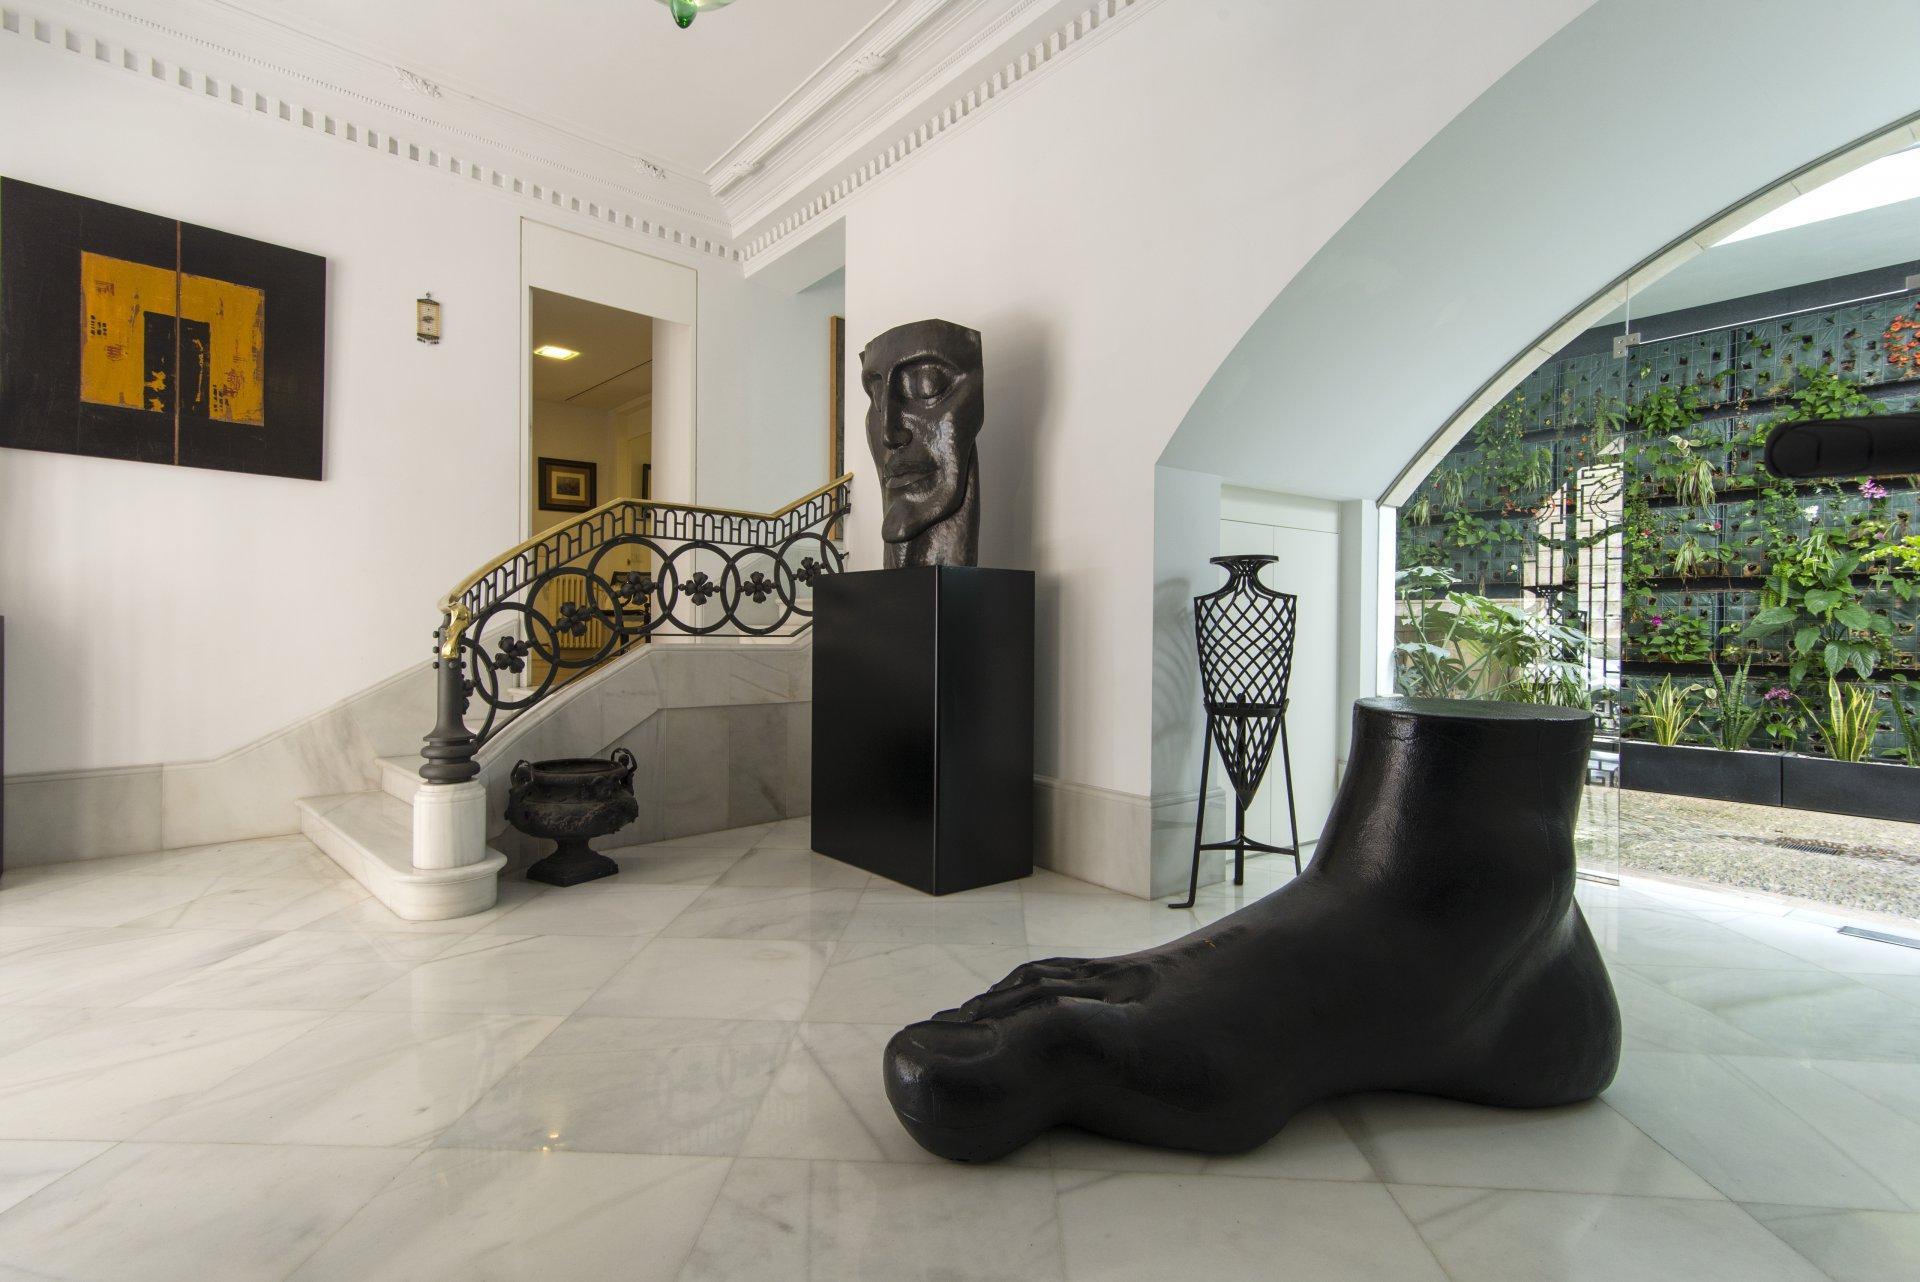 annonce vente h tel particulier palma de mallorca casco antiguo 07001 12 pi ces john taylor. Black Bedroom Furniture Sets. Home Design Ideas